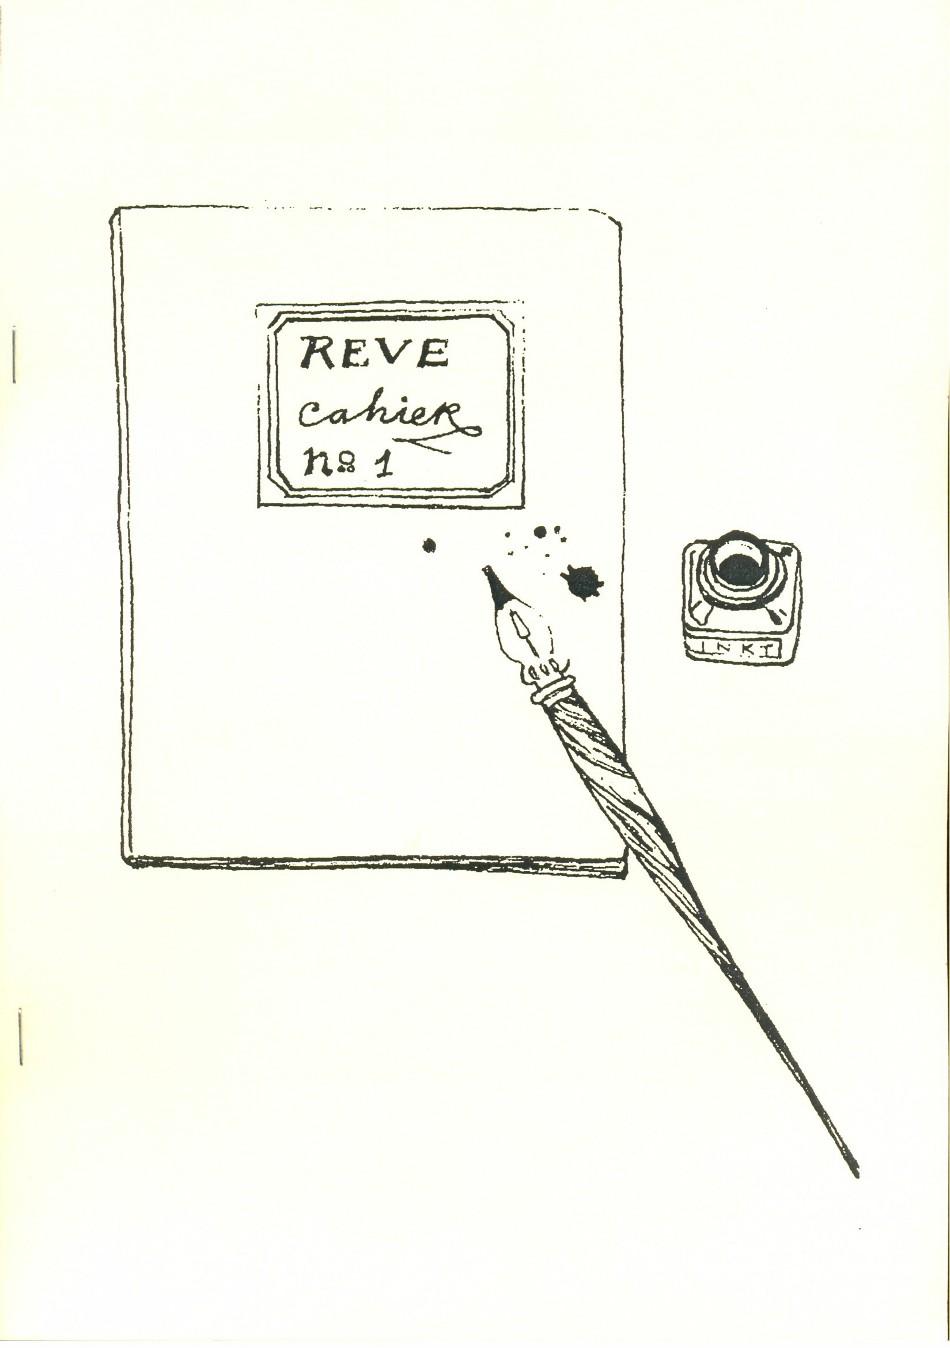 DIVERSEN - Reve Cahier nr.1, Reve Buitengaats